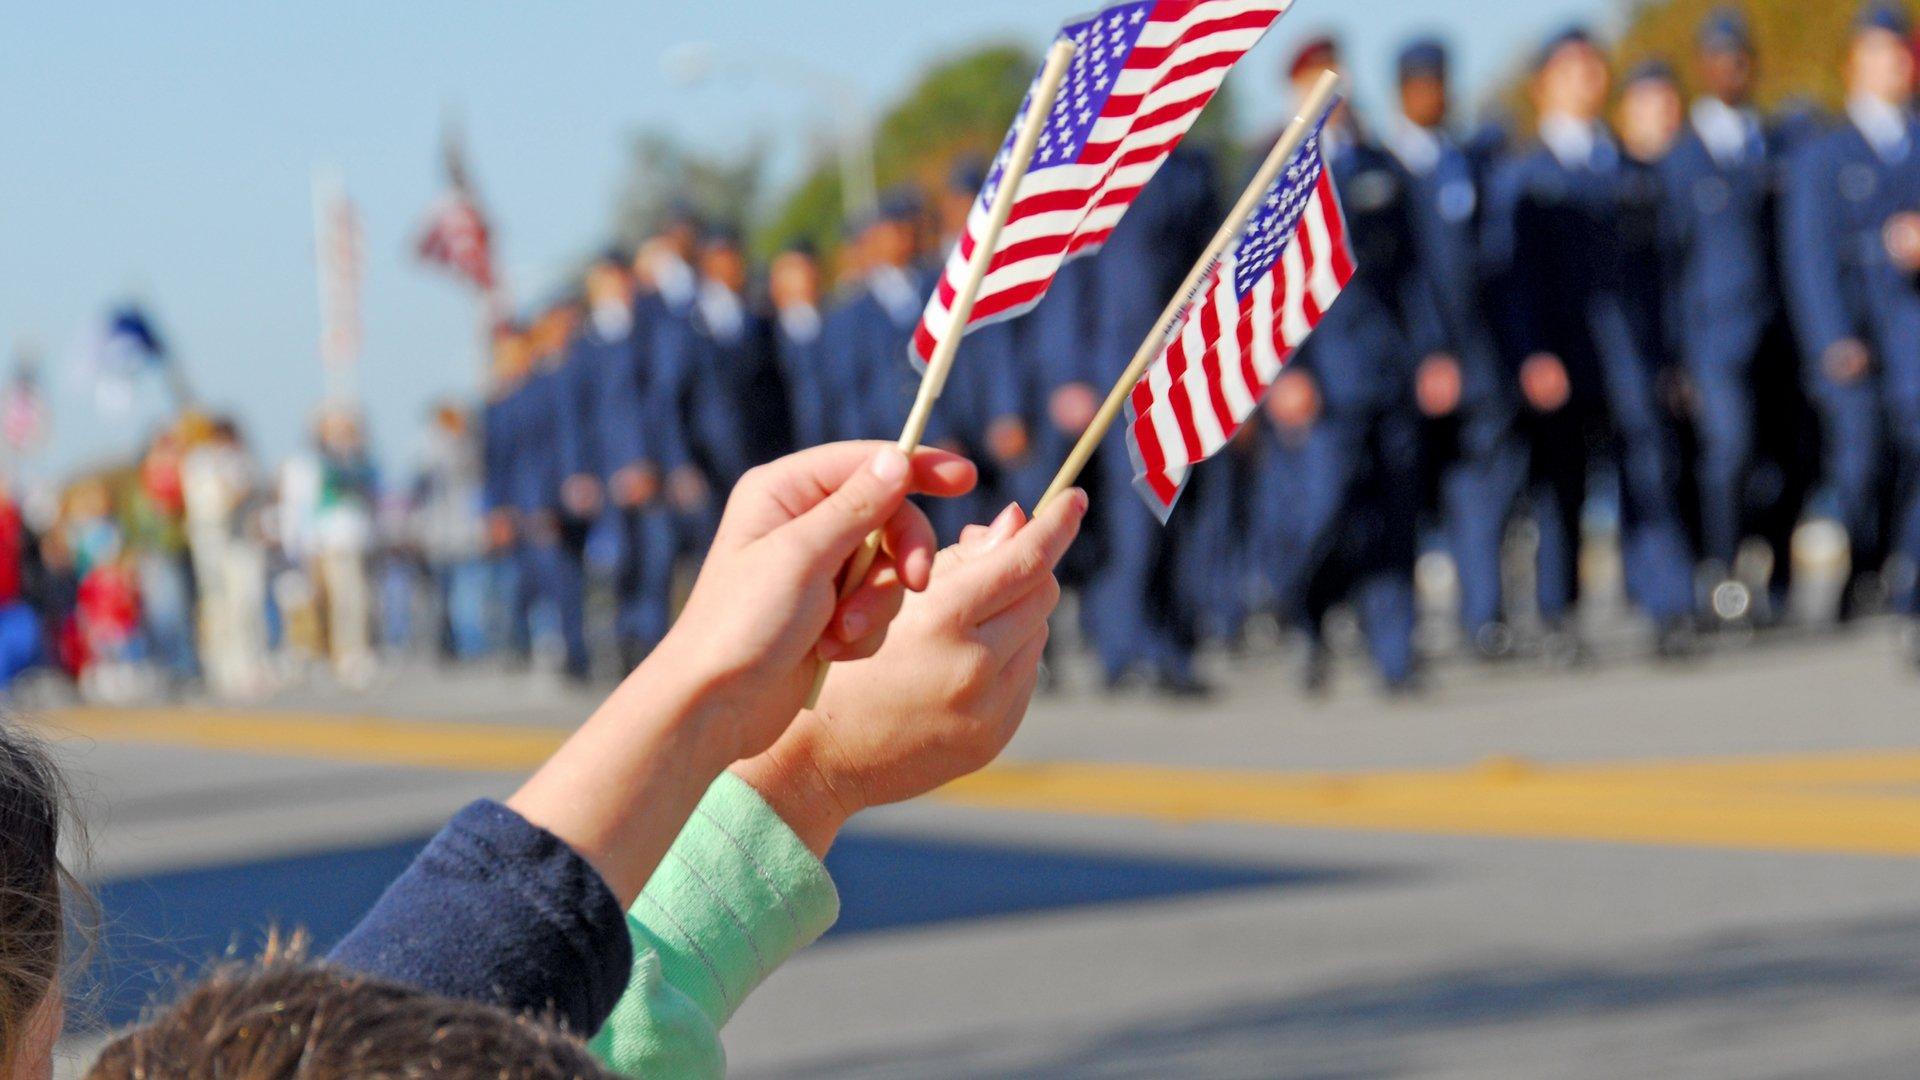 Handheld American Flags at Parade